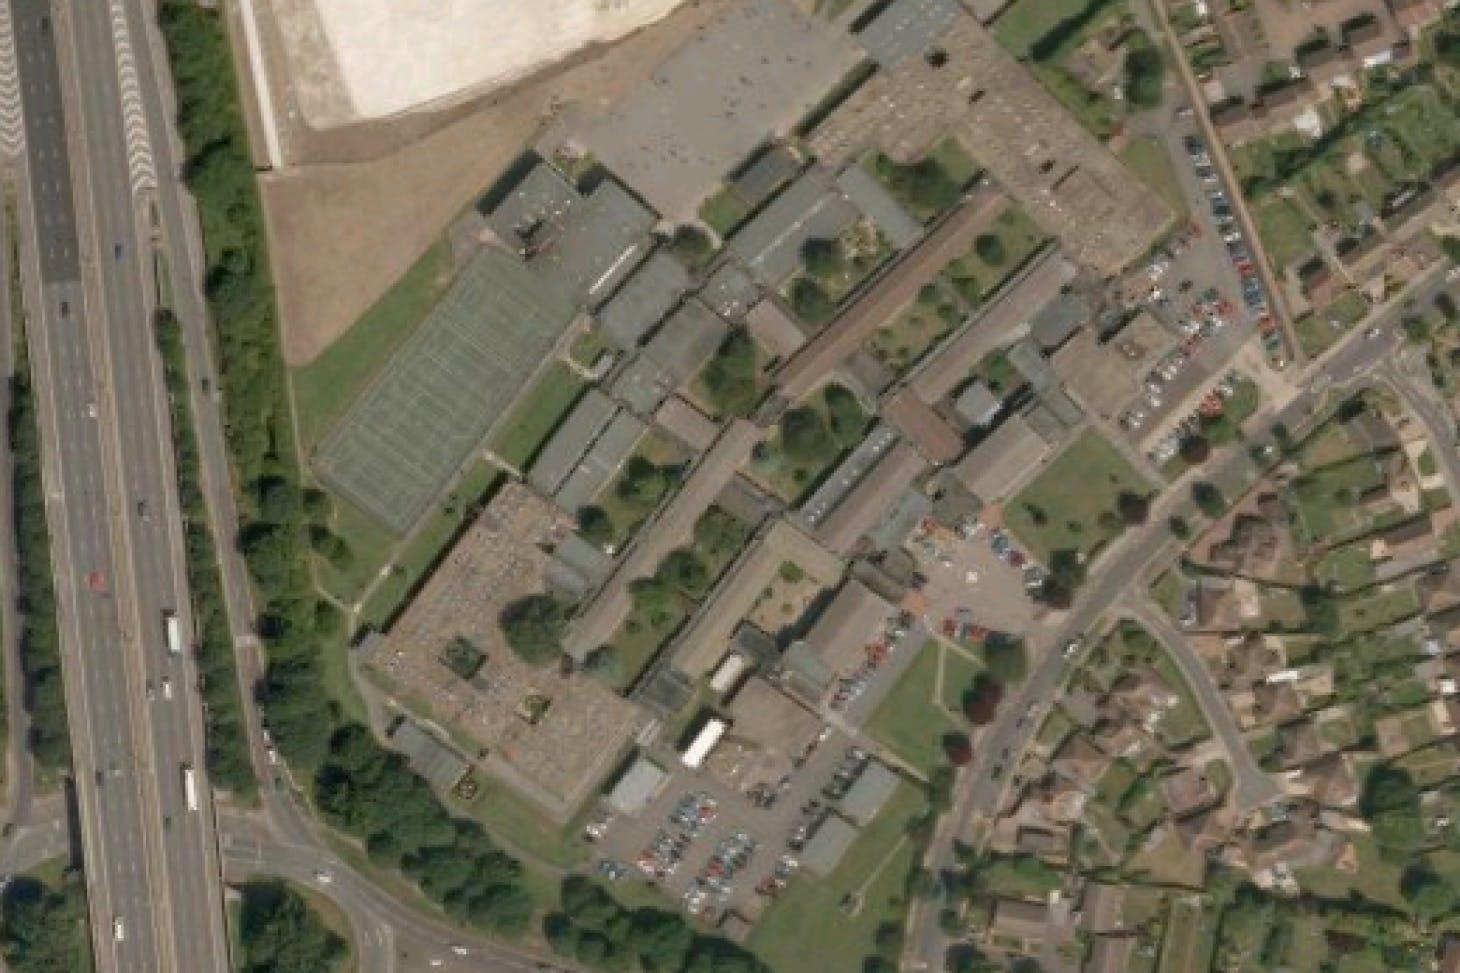 Challney High School for Boys Union | Grass rugby pitch